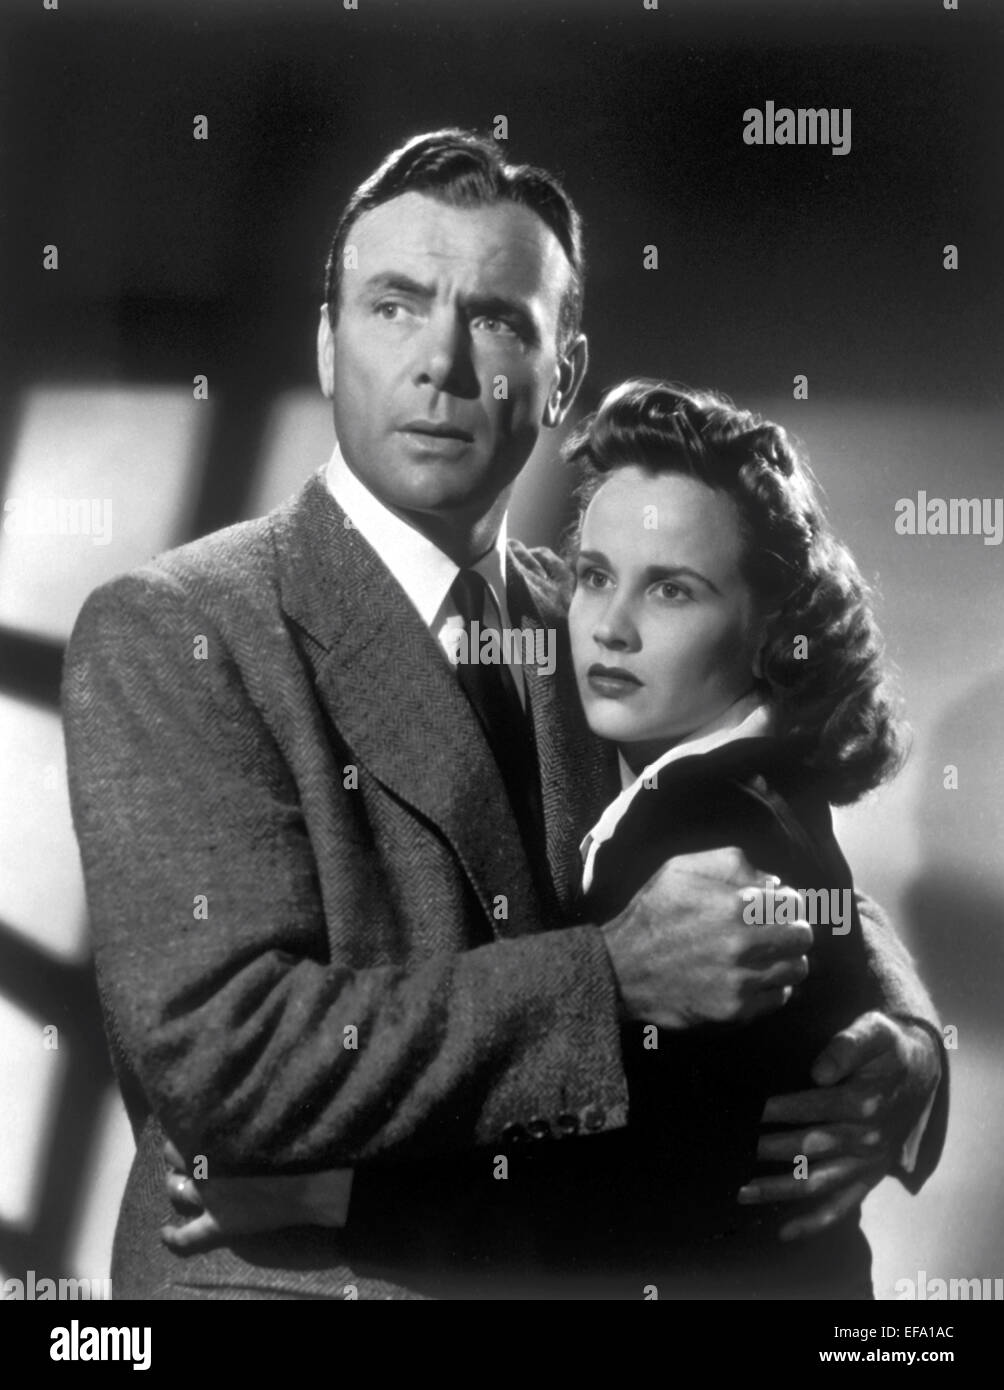 DEAN JAGGER, KIM HUNTER, WHEN STRANGERS MARRY, 1944 - Stock Image